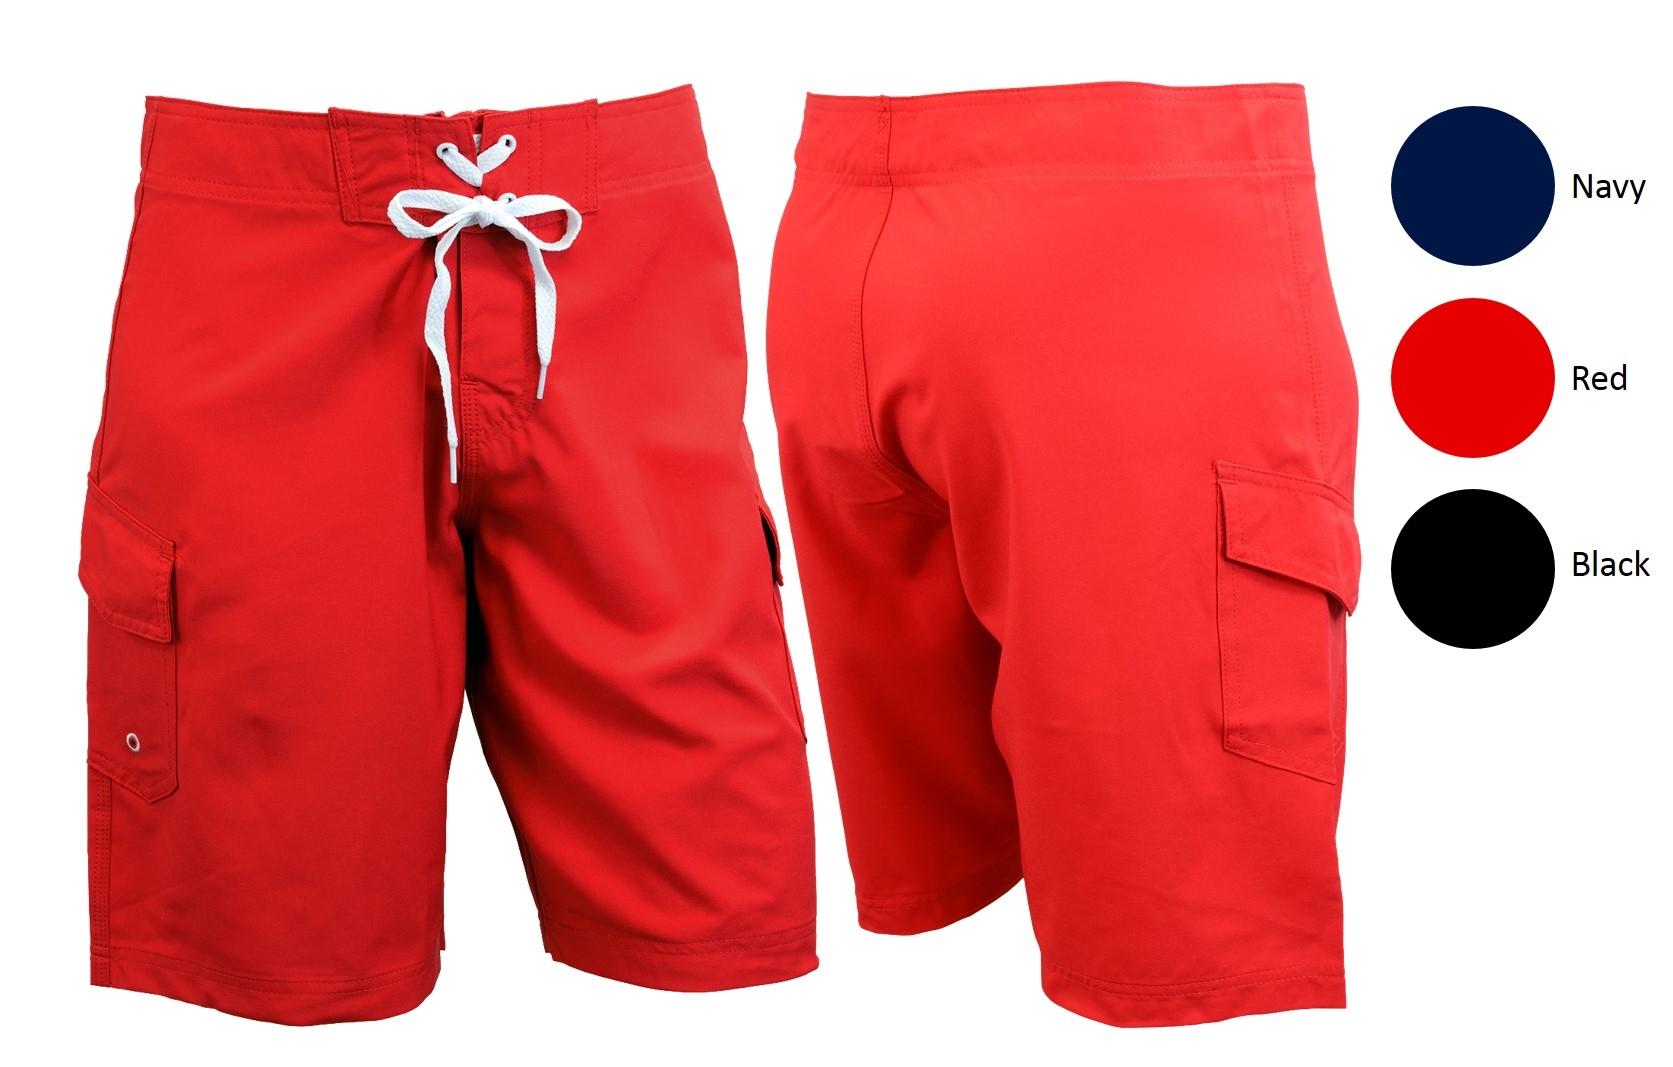 Ultrastar Men's 4-Way Stretch Swim Shorts Board Shorts